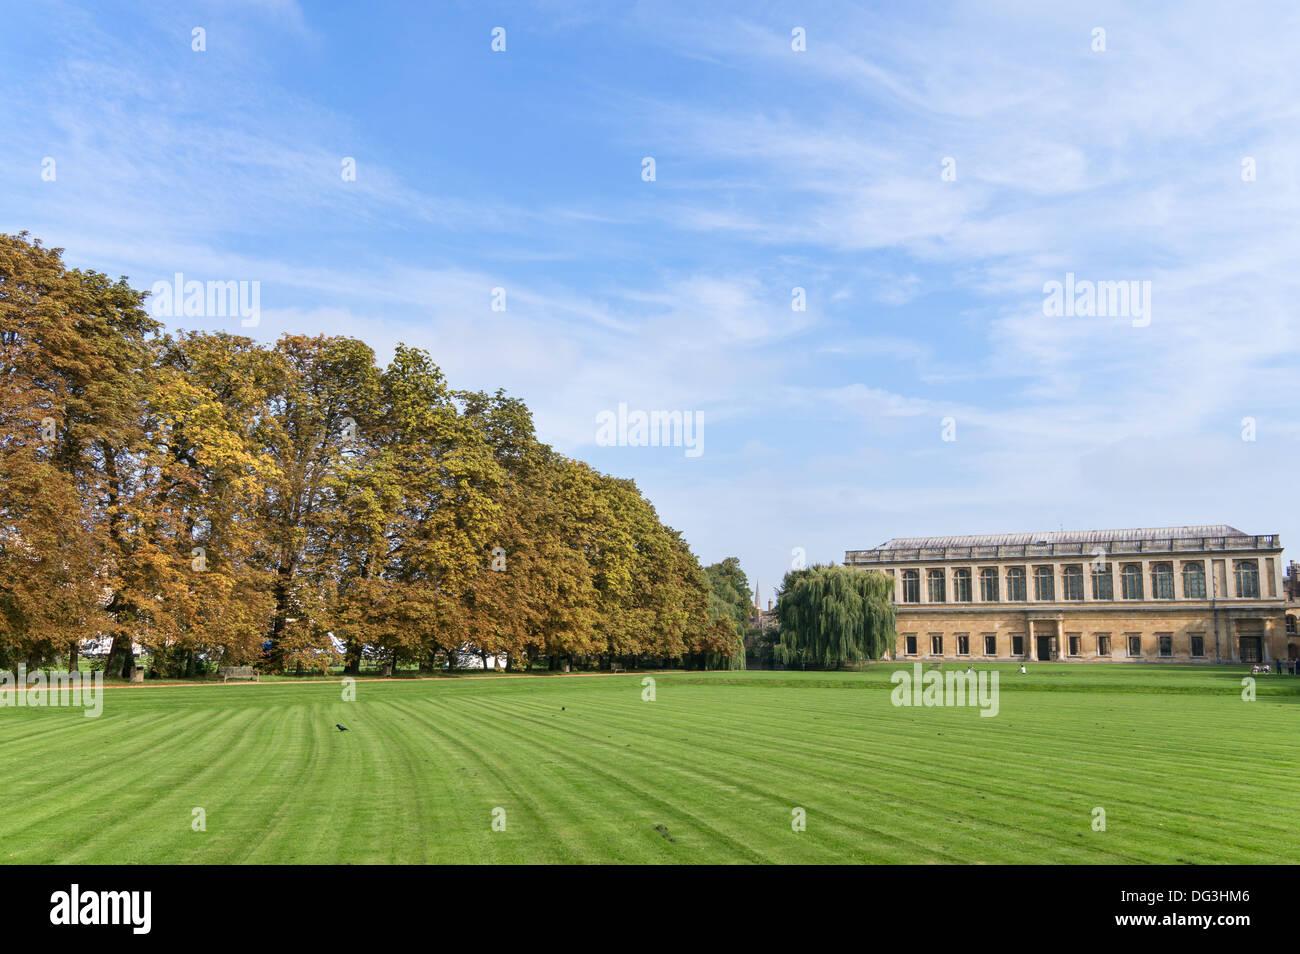 The Wren library Trinity College University of Cambridge seen with autumnal colours Cambridge, England, UK - Stock Image